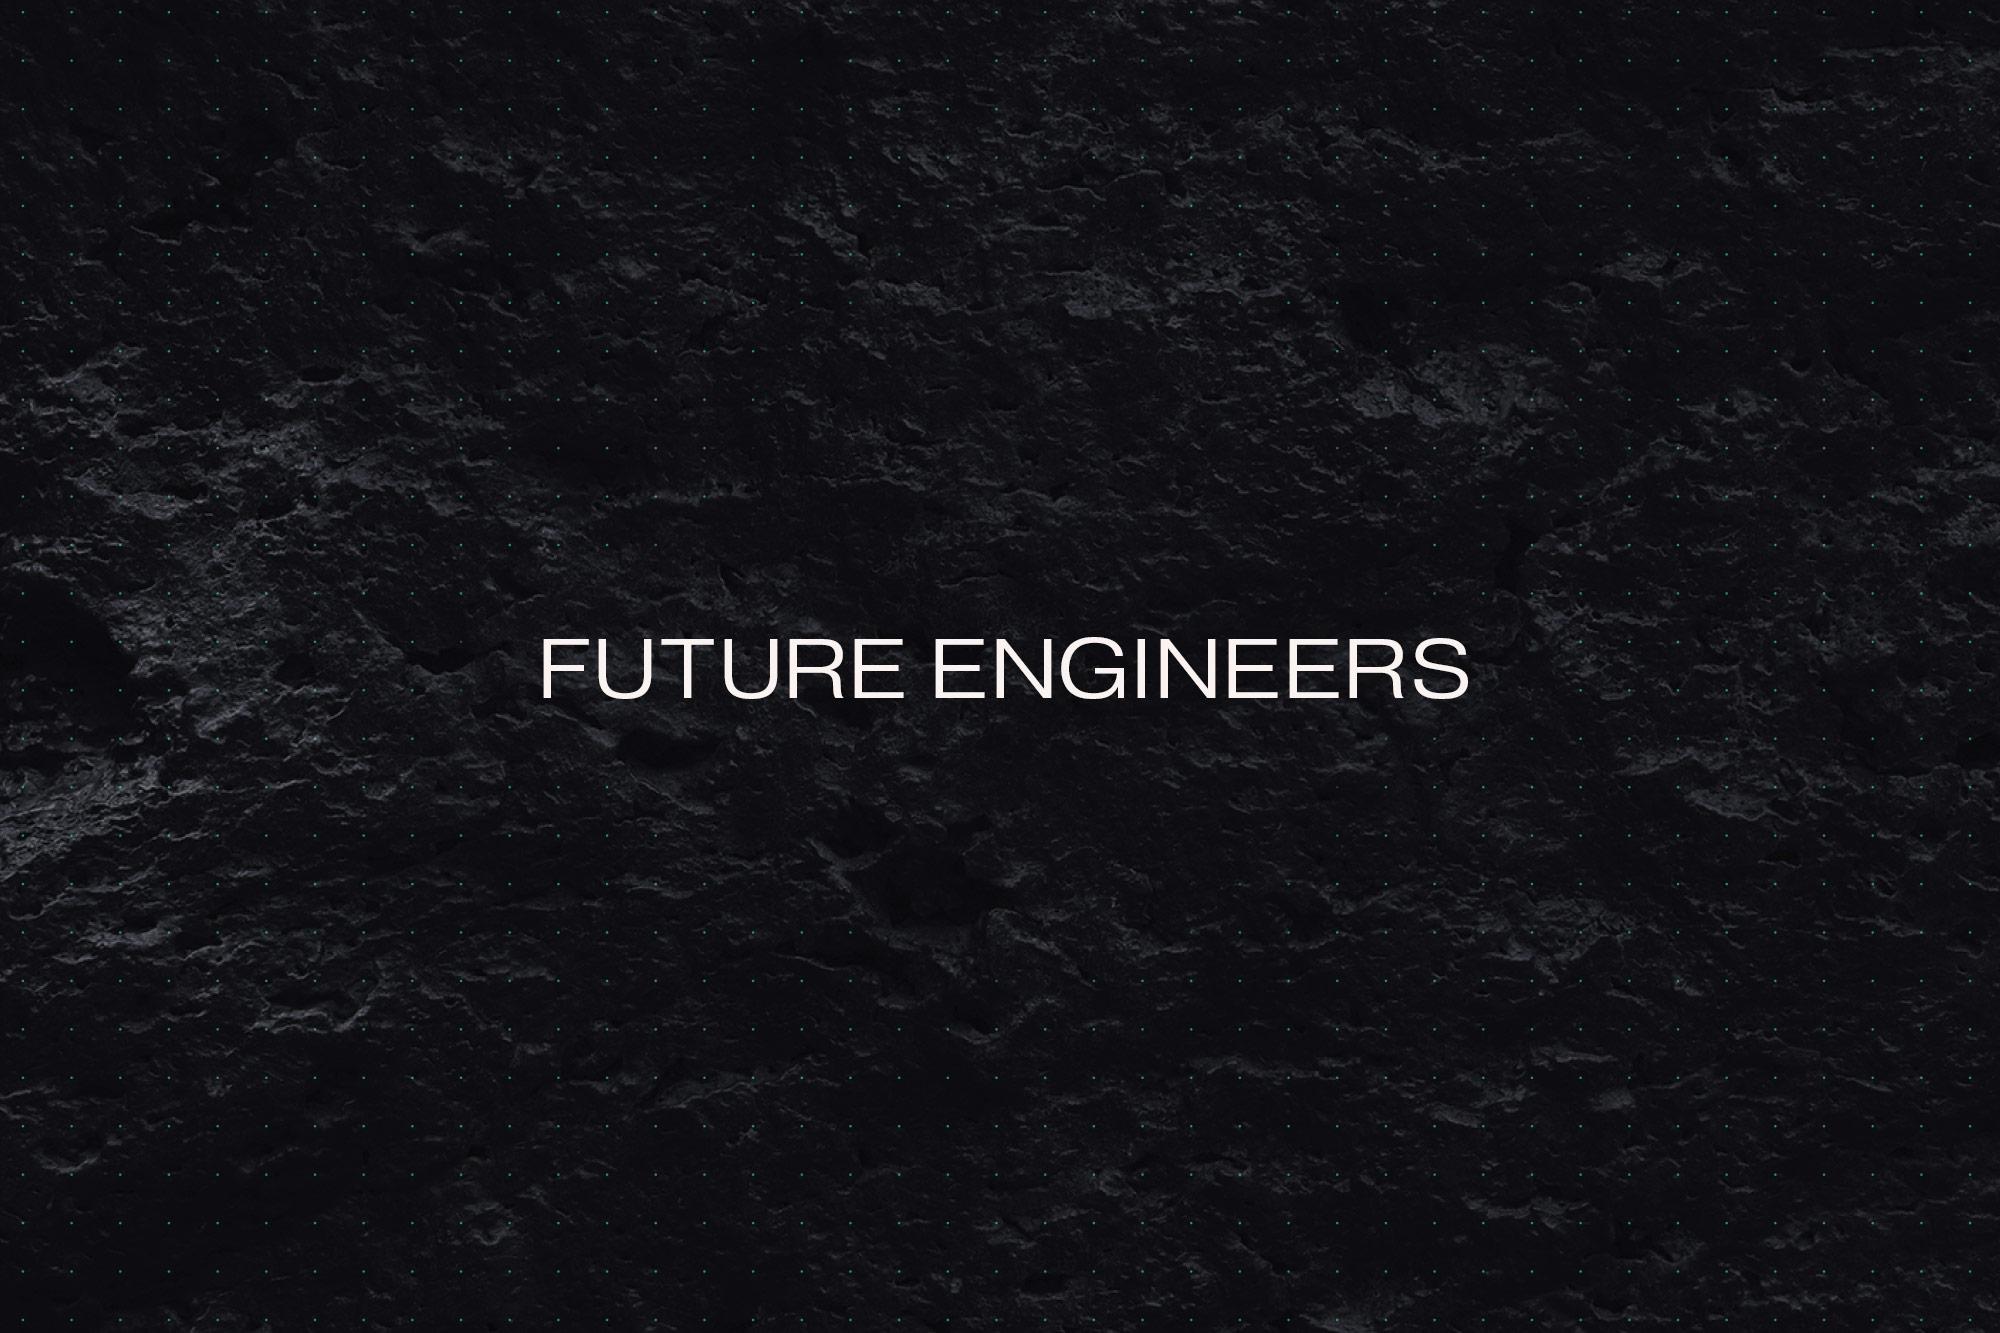 gareth-paul-jones-studio-music-design-future-engineers-branding-cs-03